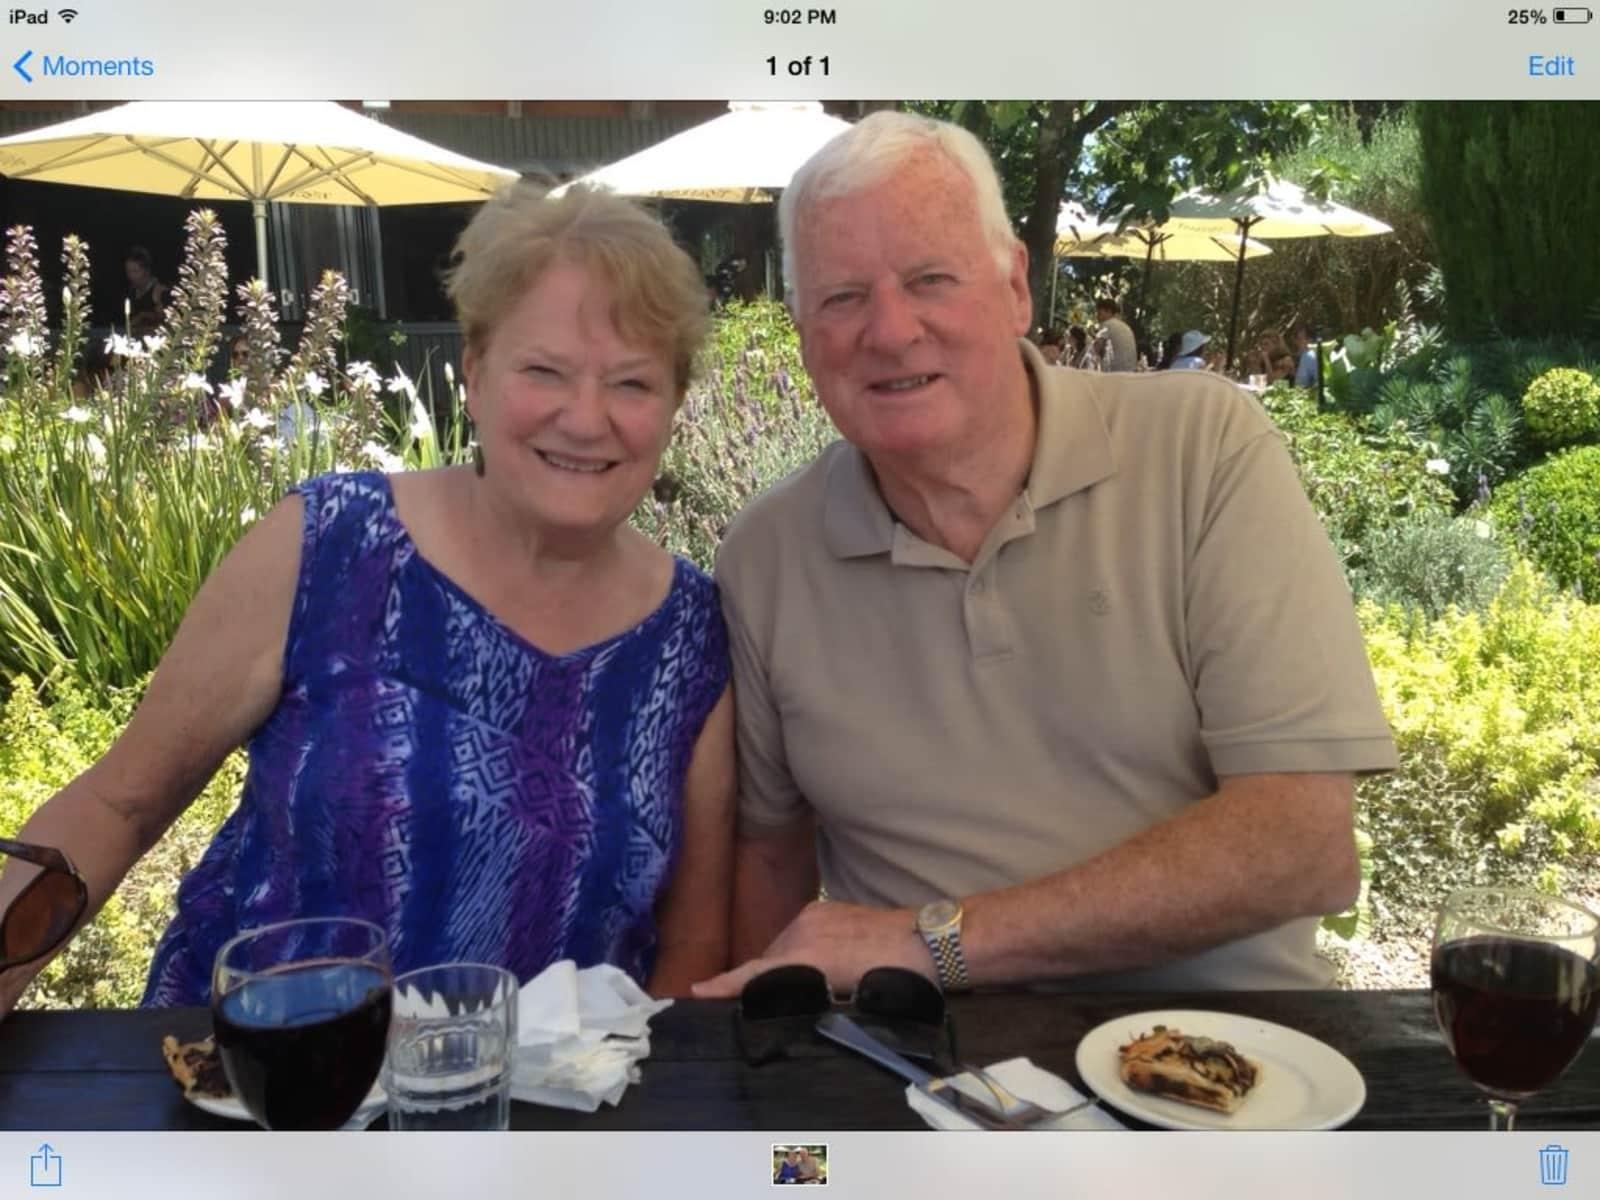 Laura & Frank from Geelong, Victoria, Australia